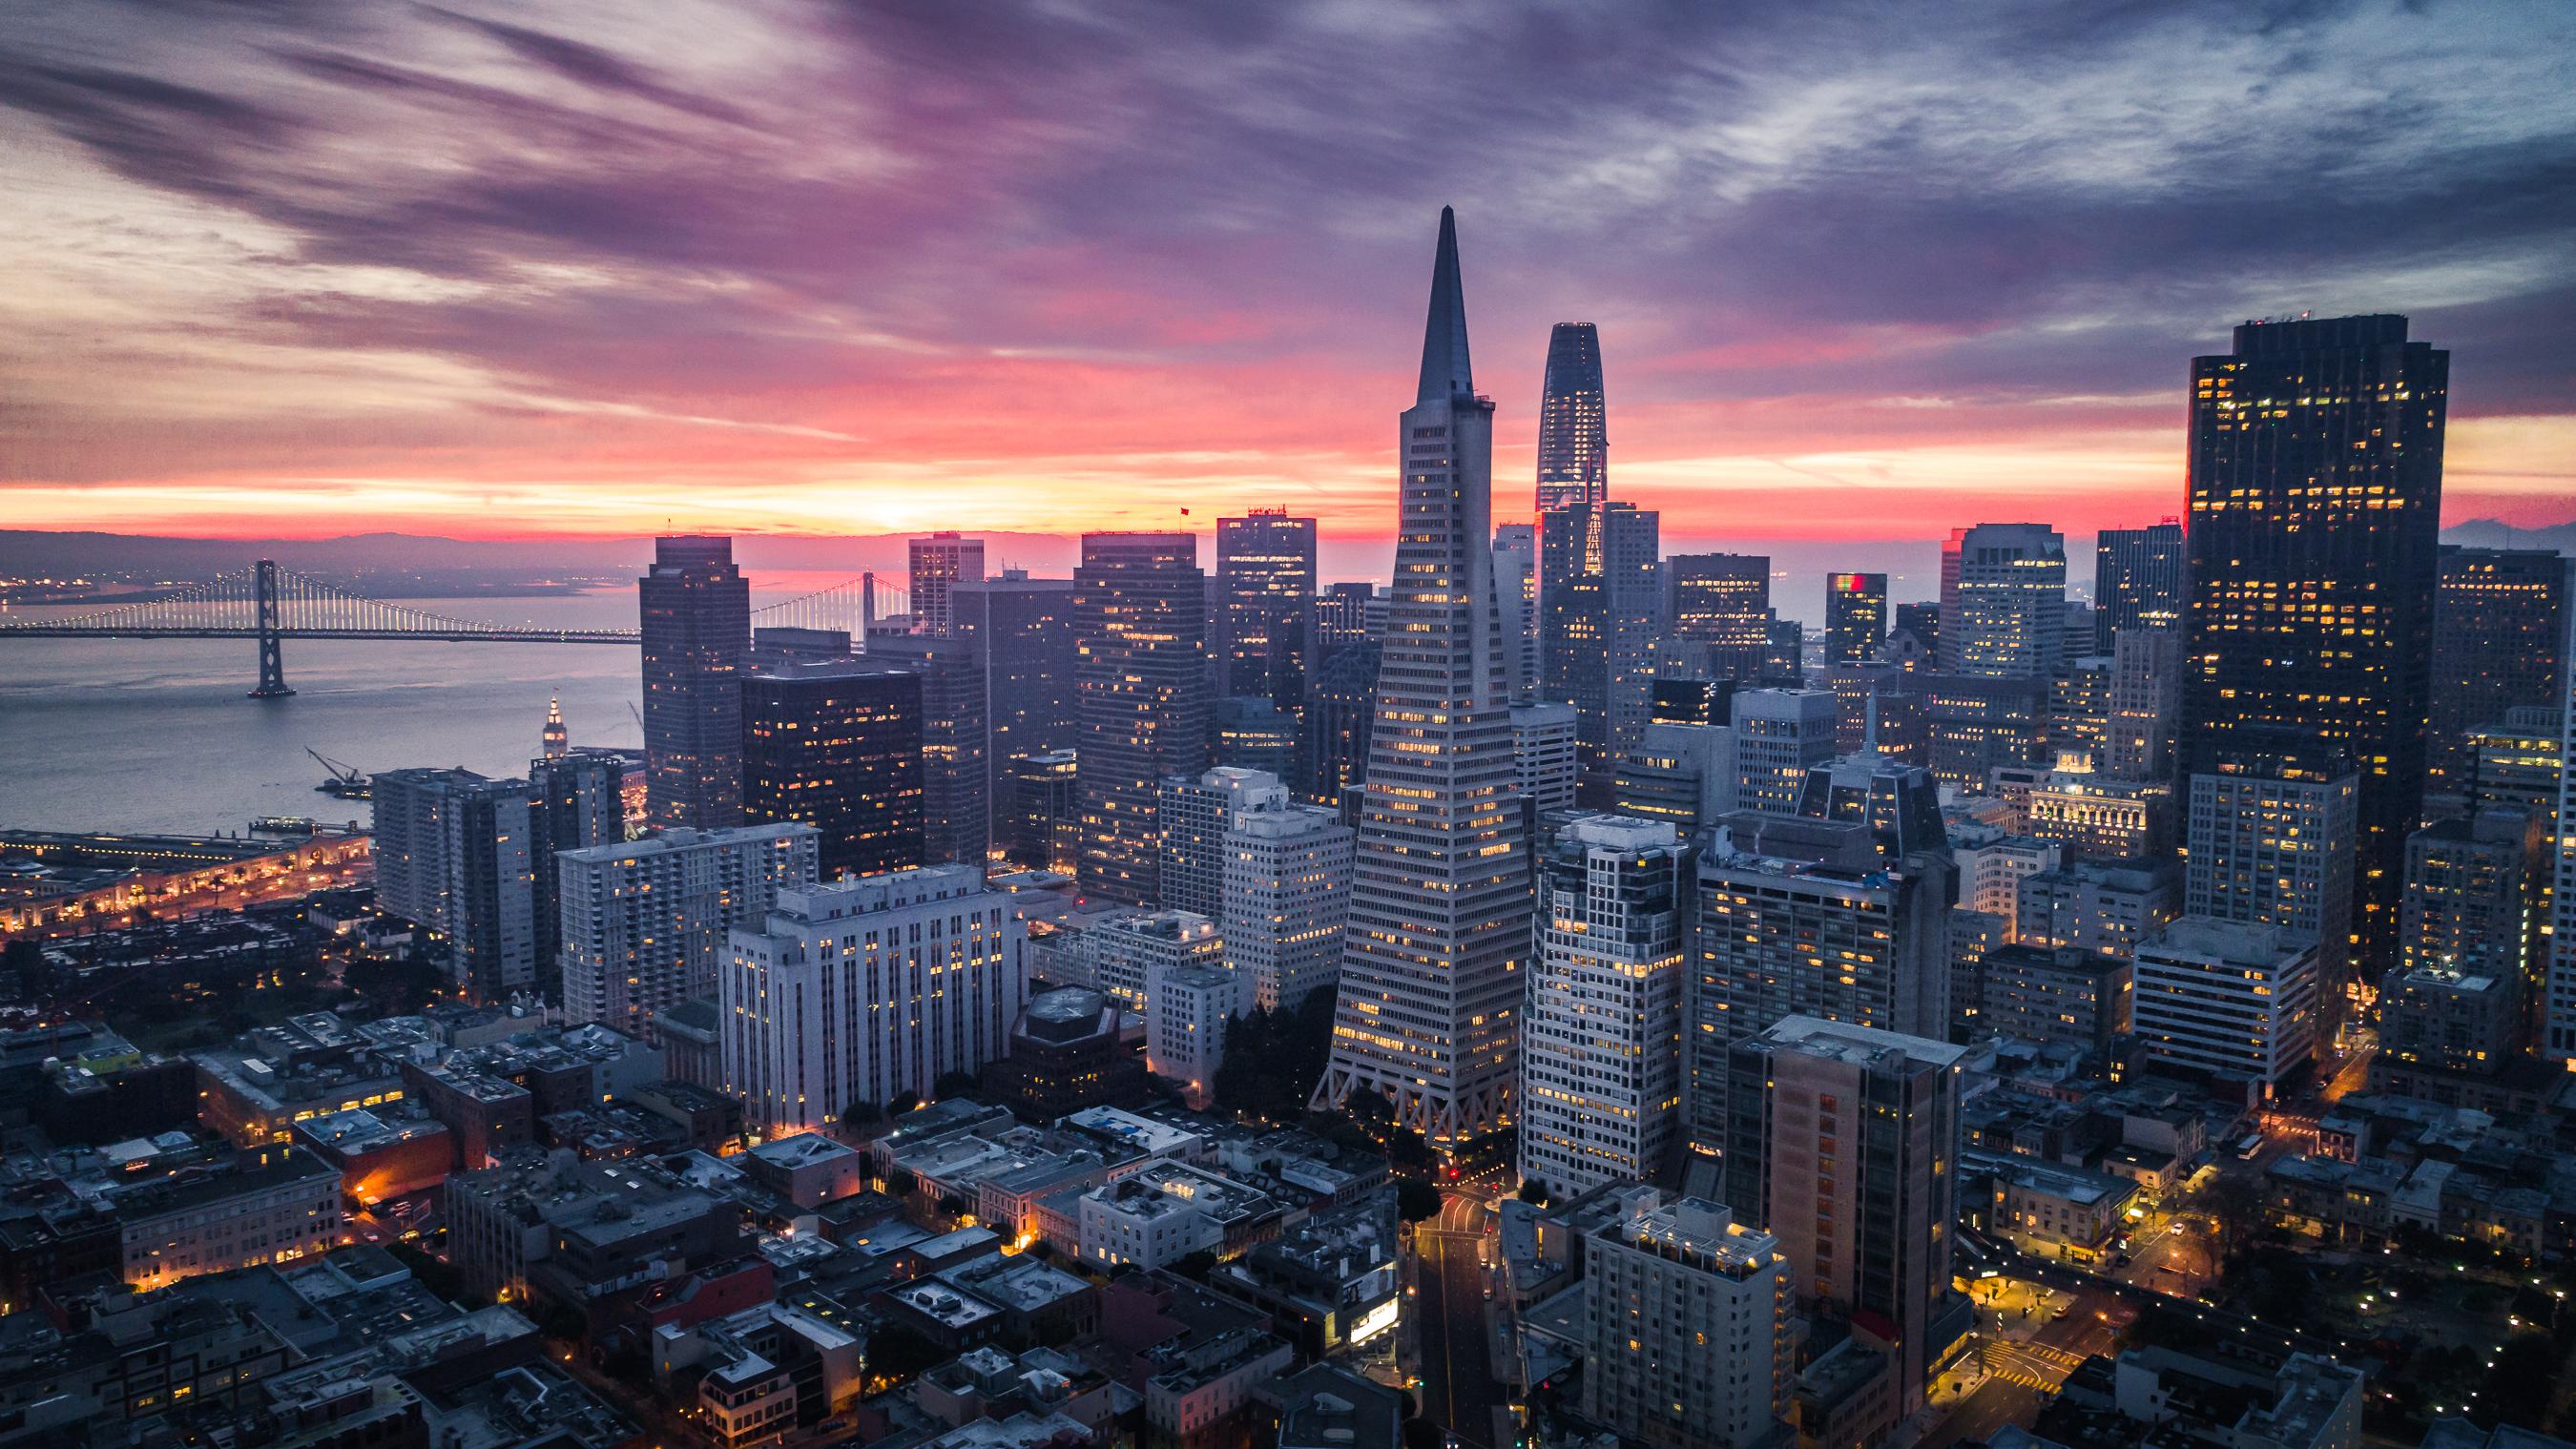 A scene of San Francisco